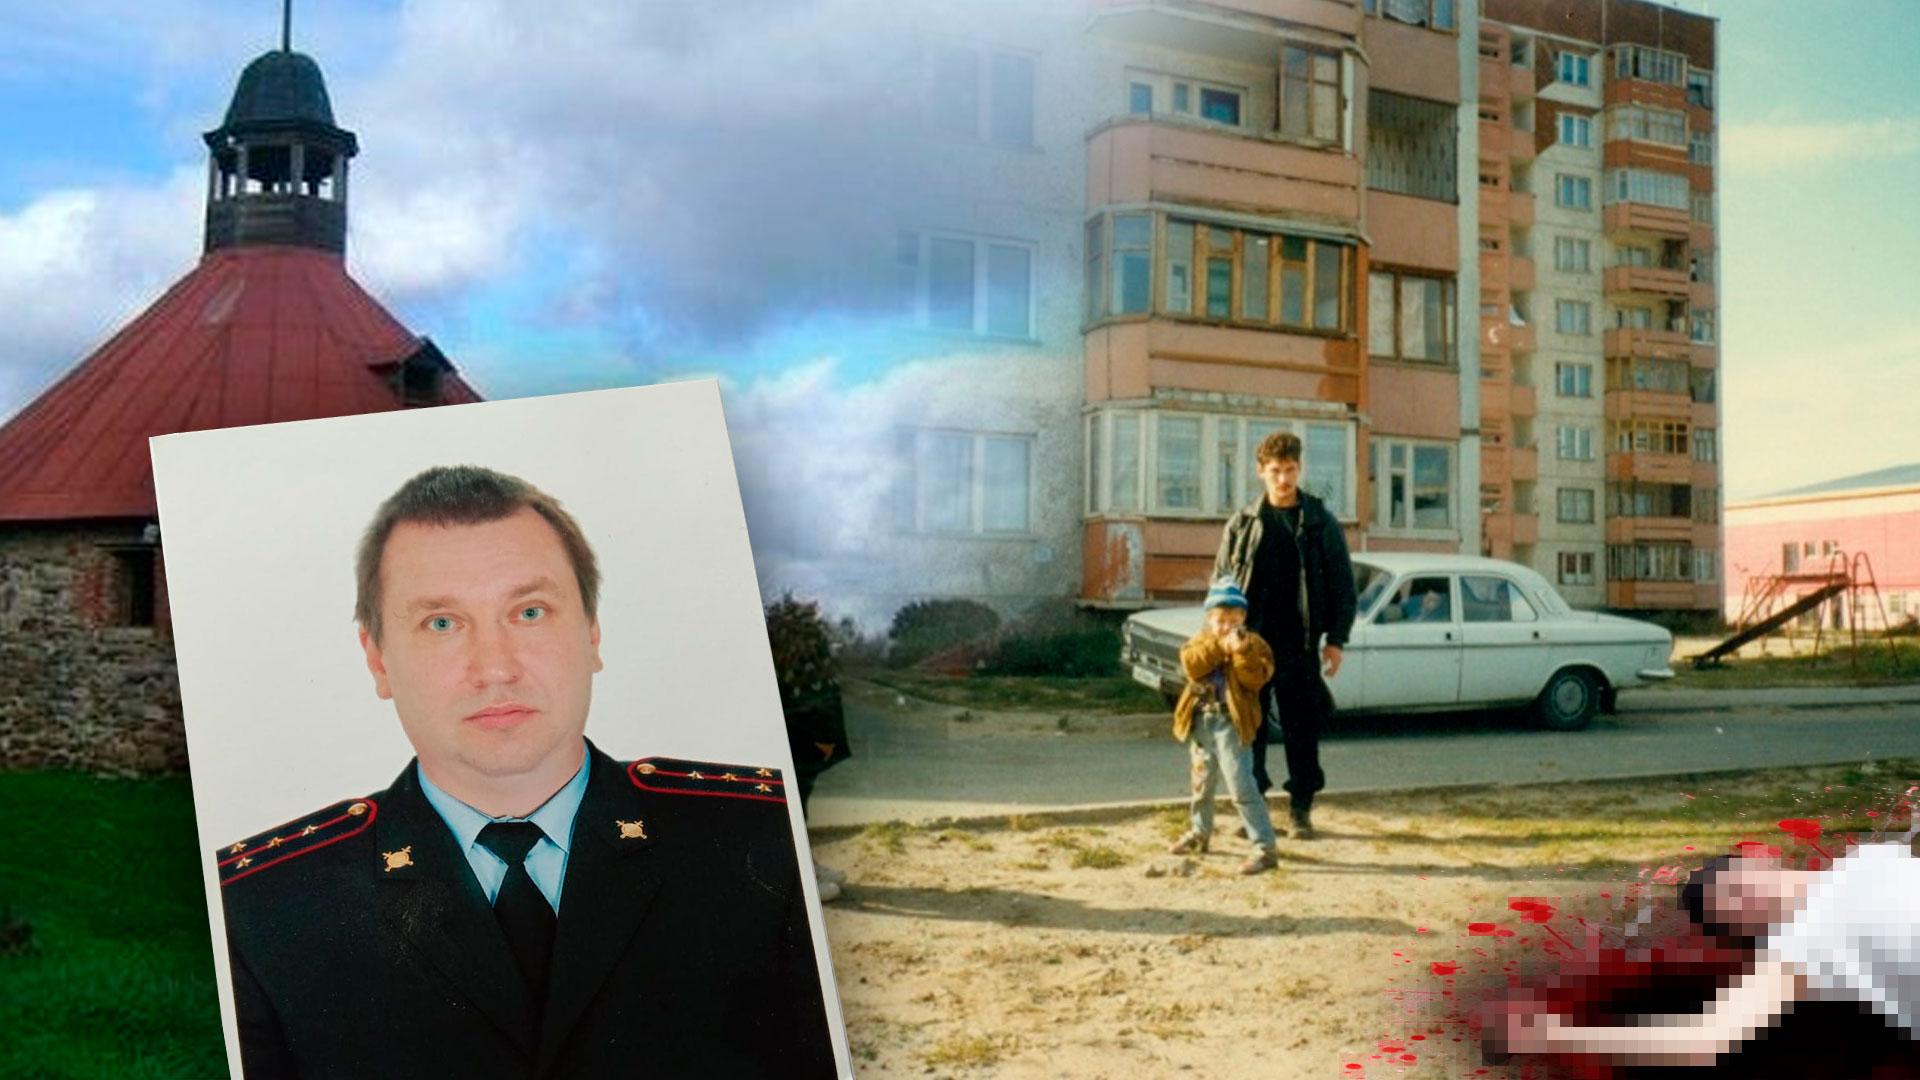 Виктор Корчагин: «Уже нет бандитов, все чиновники»